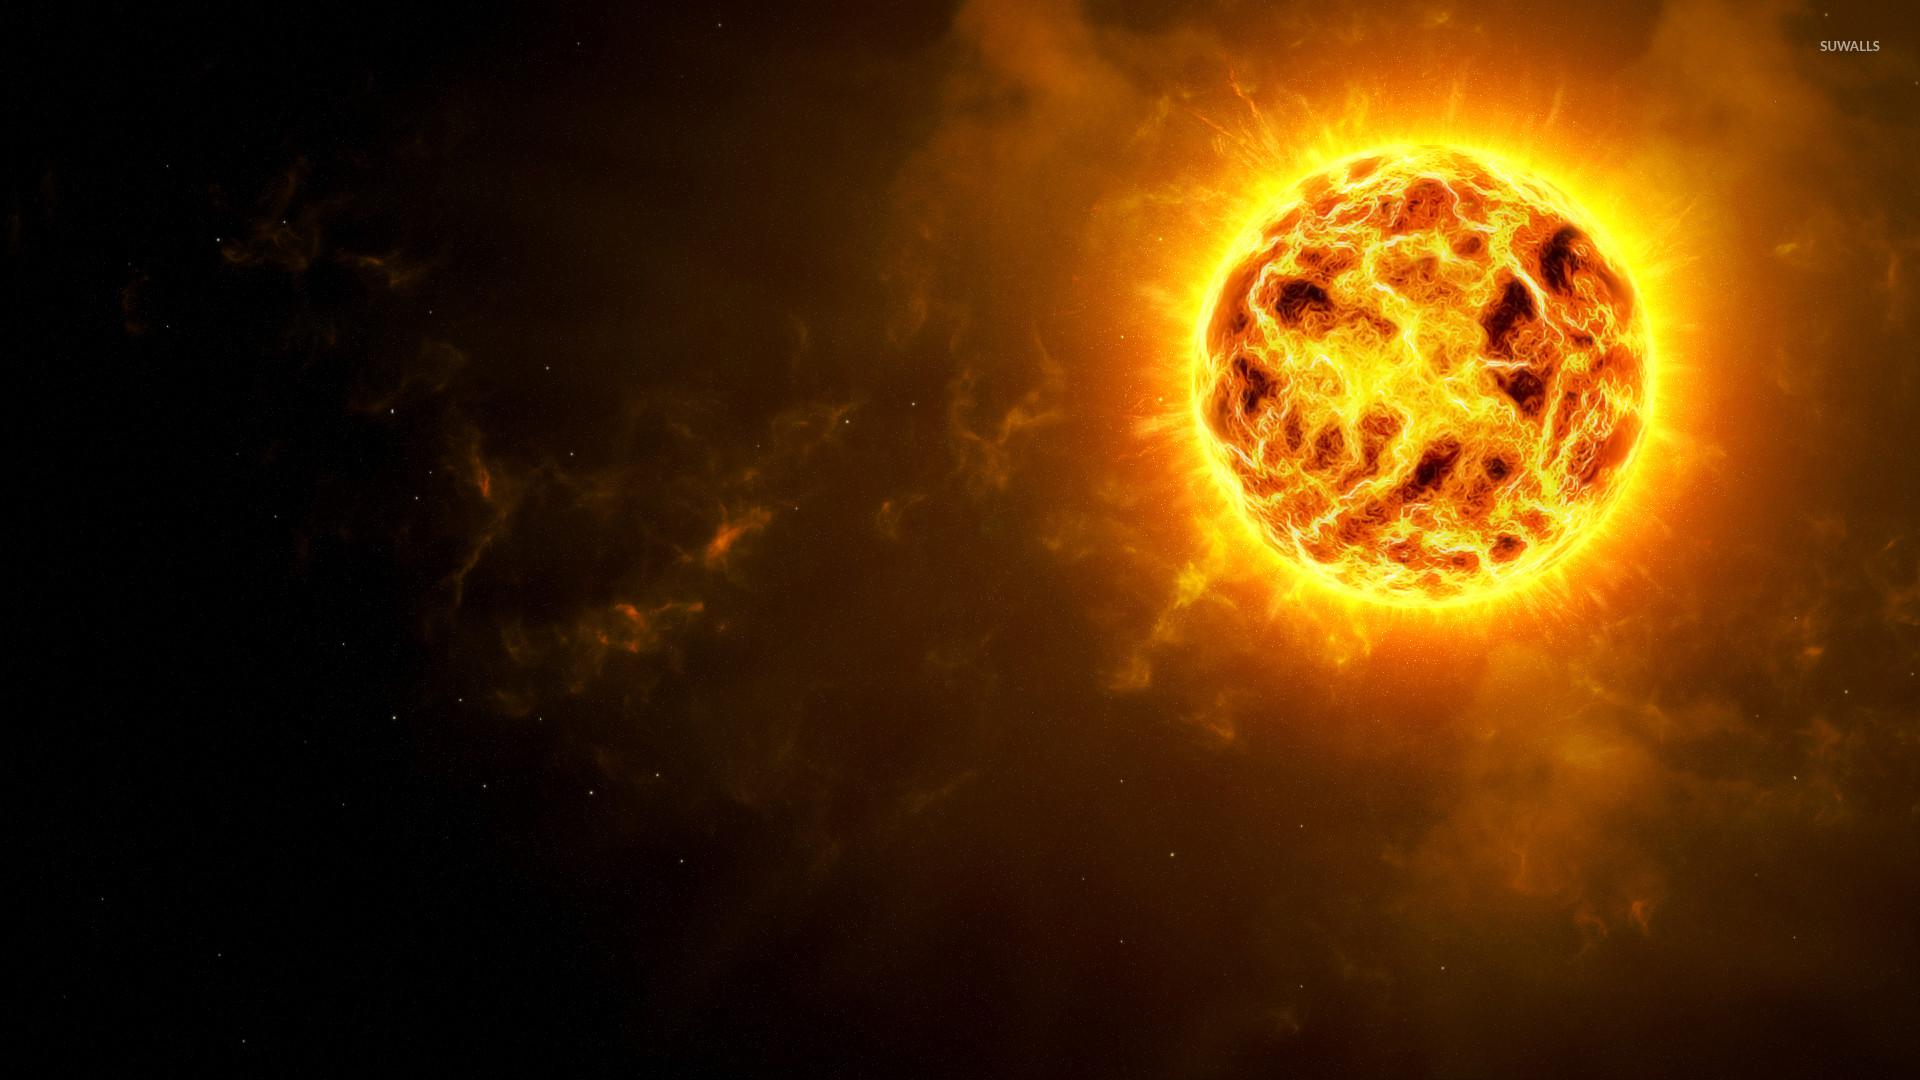 Sun glowing in the universe wallpaper